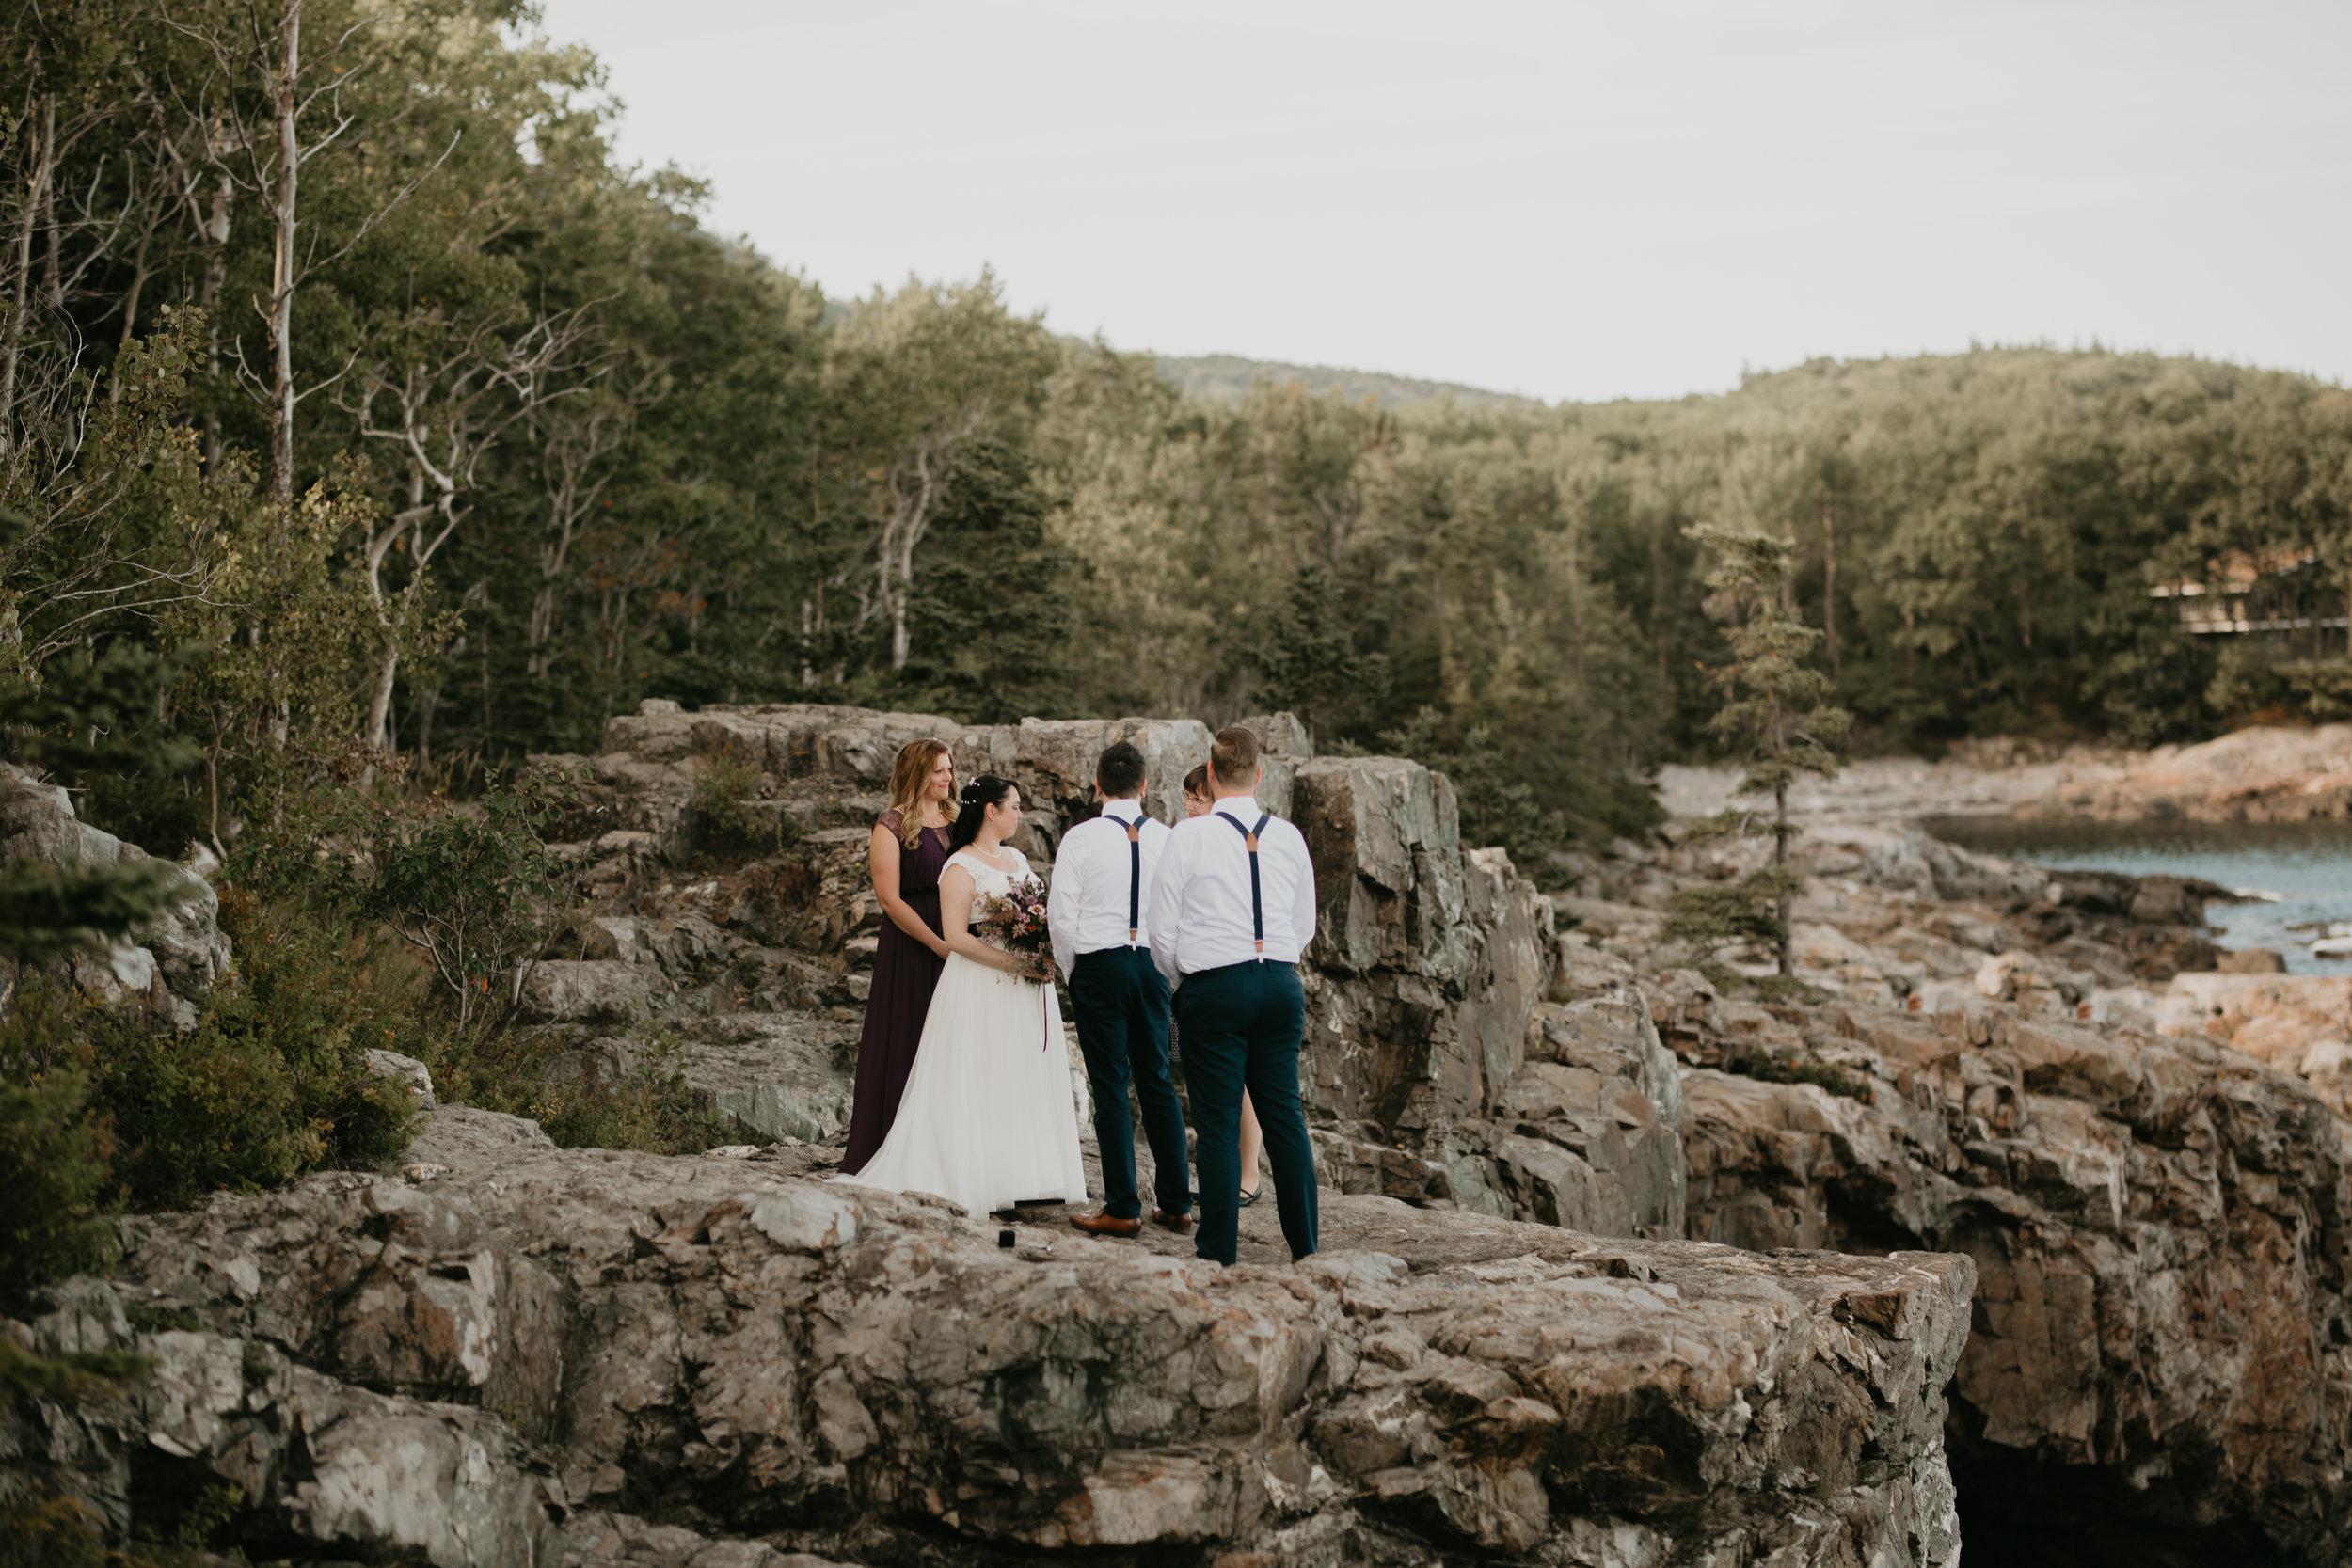 nicole-daacke-photography-Elopement-rocky-shoreline-coast-Acadia-National-Park-elopement-photographer-inspiration-maine-elopement-otter-cliffs-schoonic-head-point-19.jpg